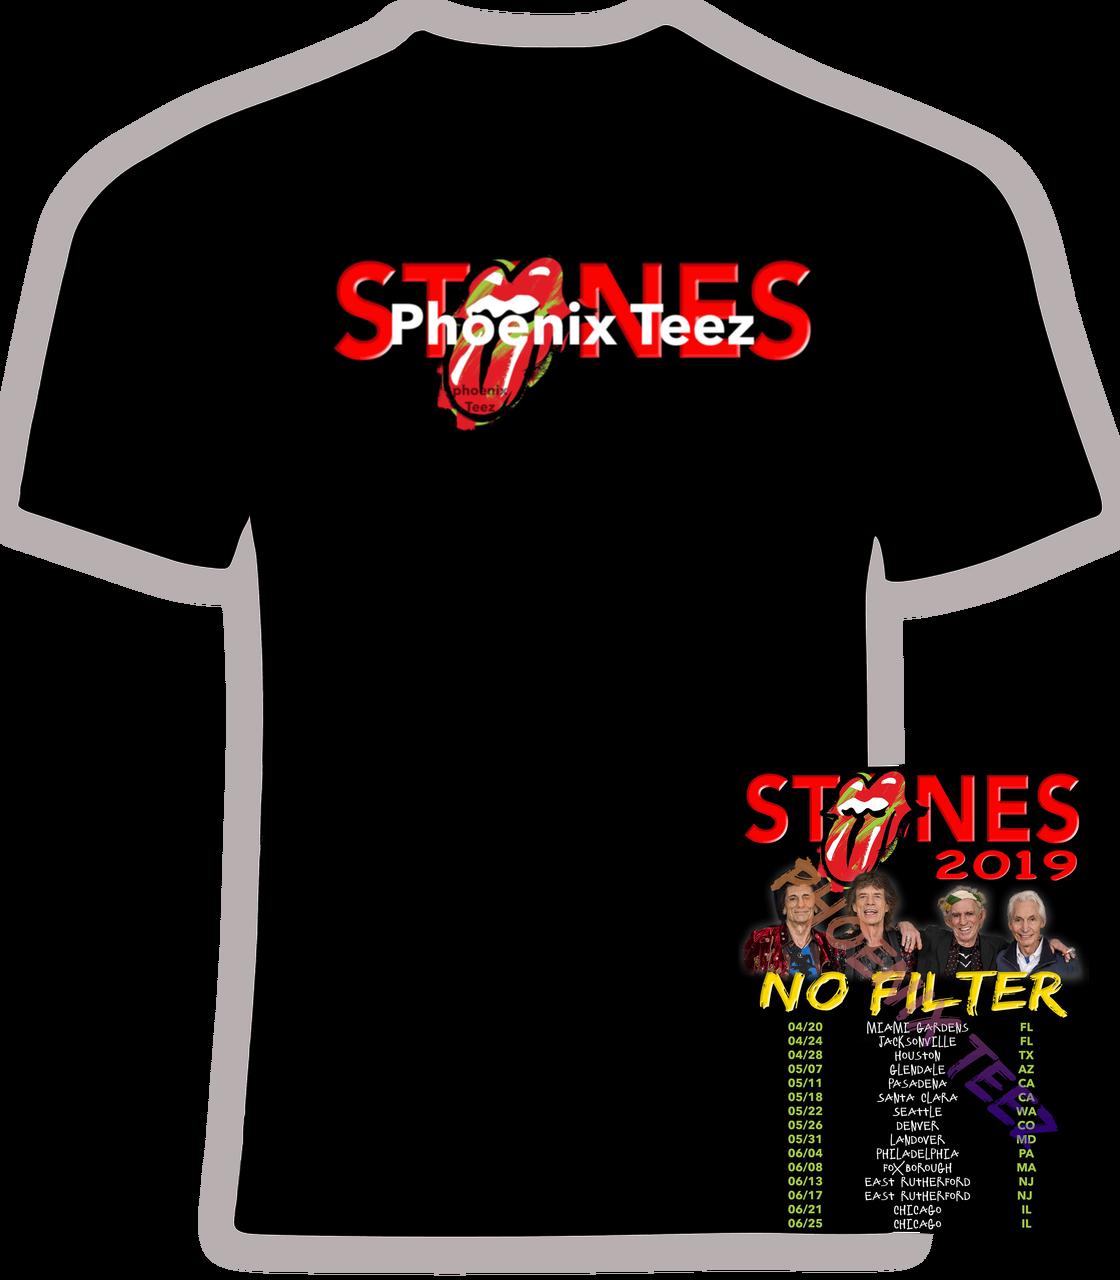 6ac663be10c3df Rolling Stones 2019 Concert Tour  No Filter  - Phoenix Tees